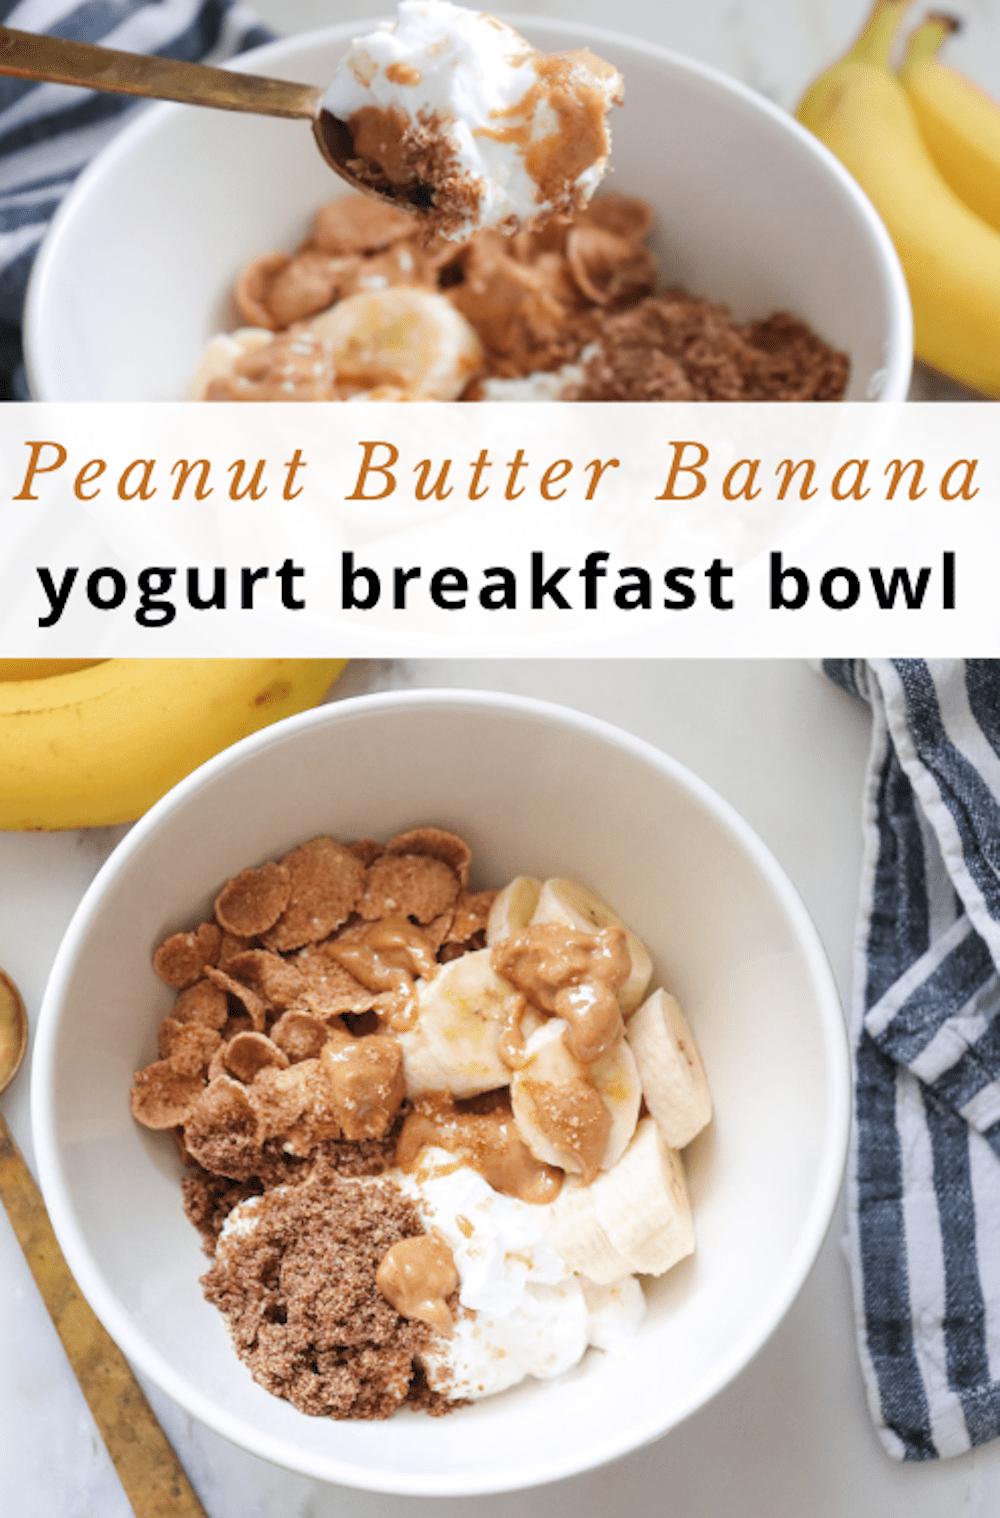 peanut butter banana yogurt breakfast bowl